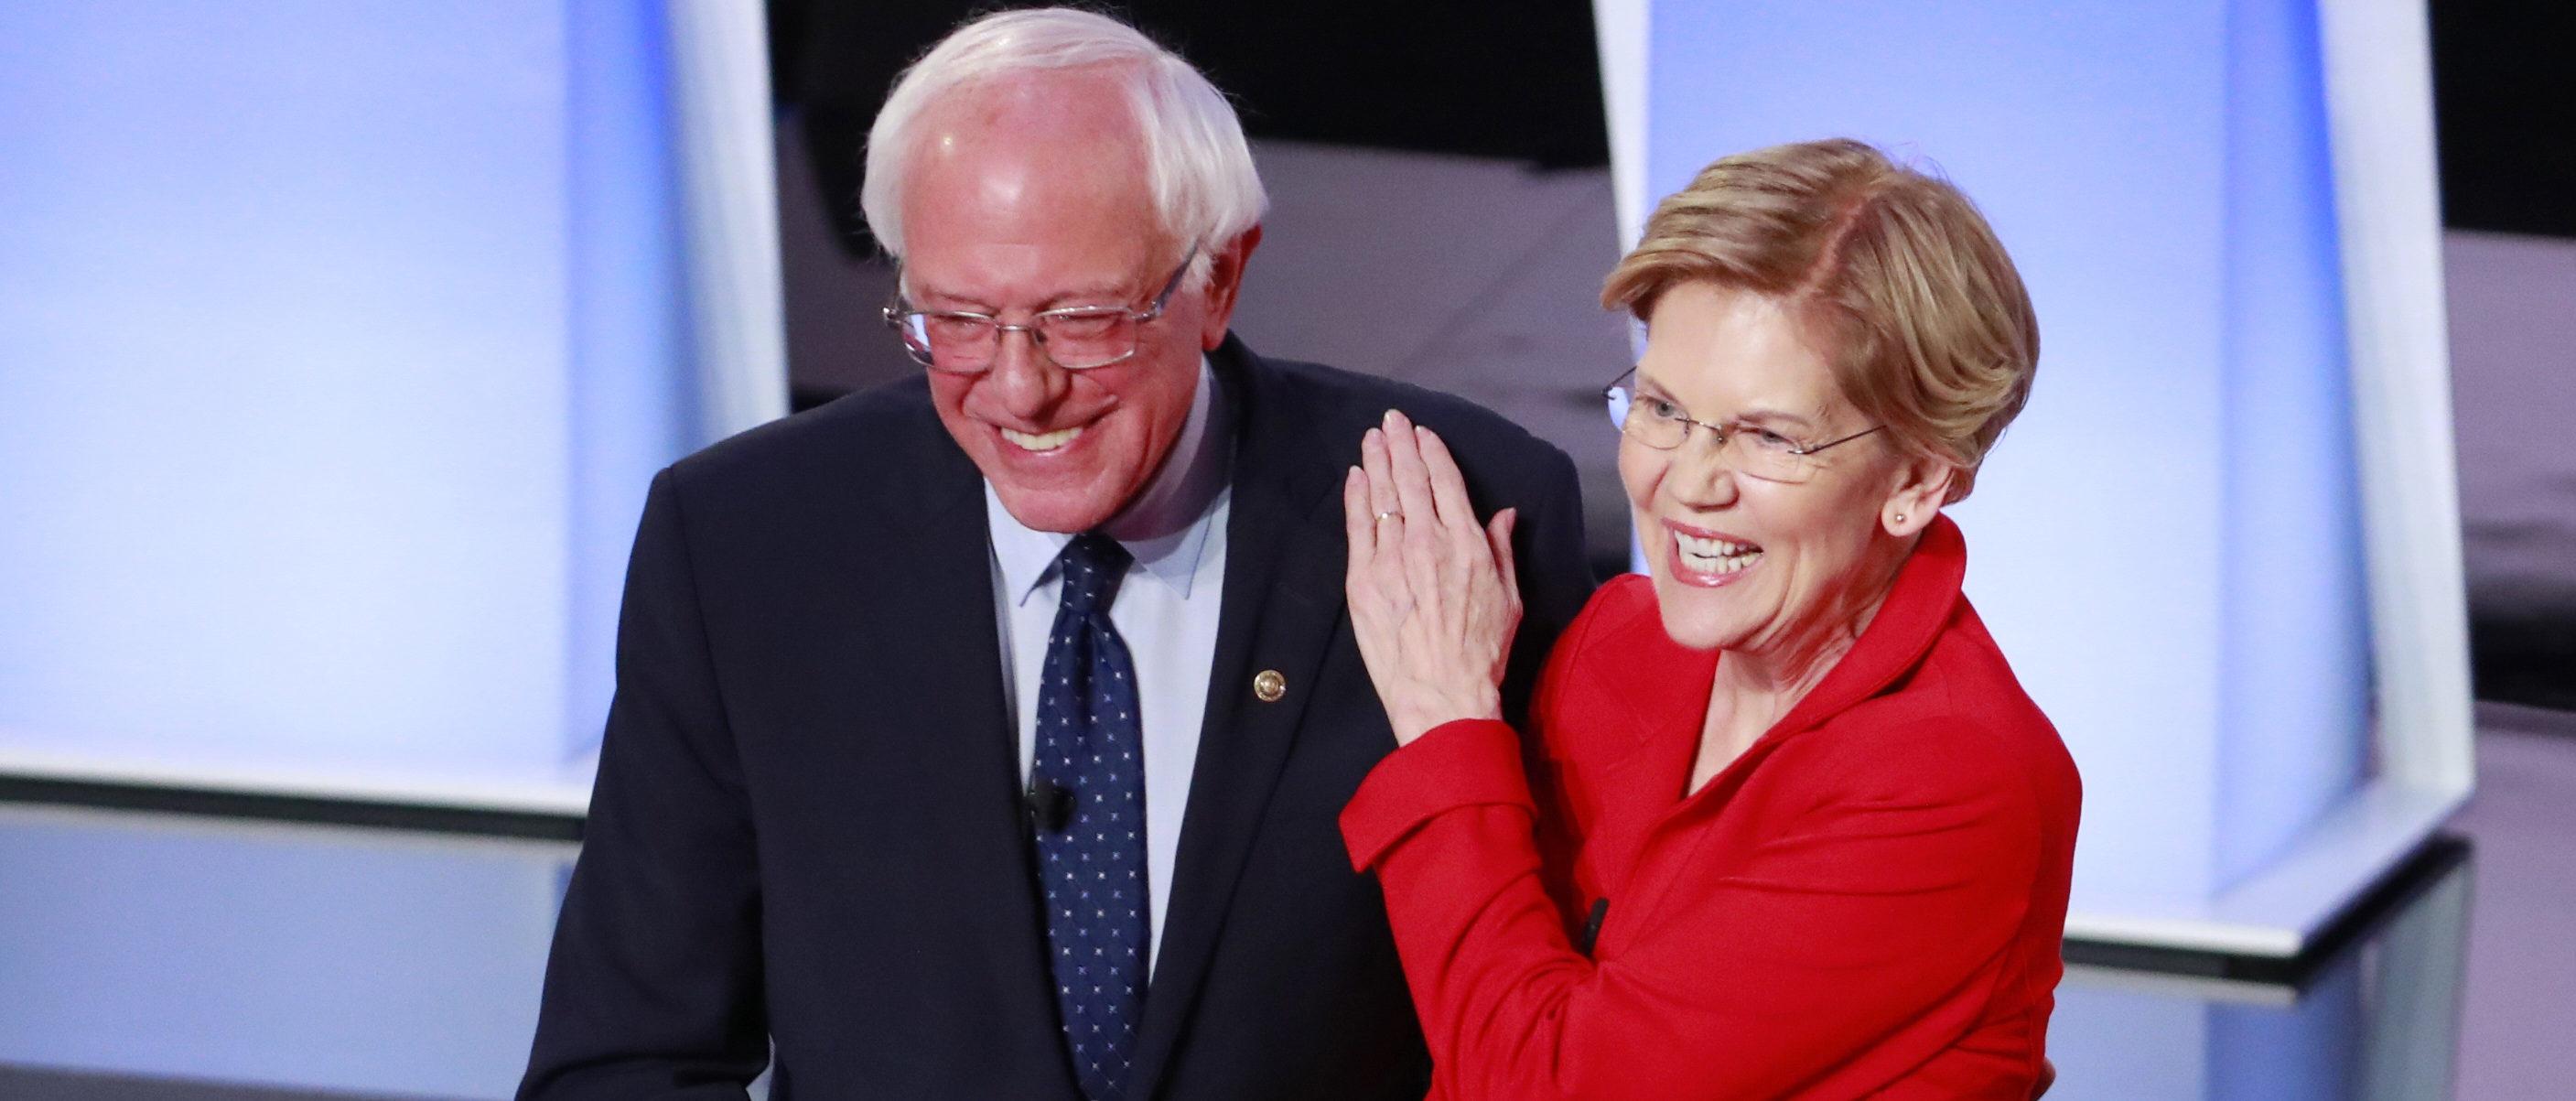 U.S. Senator Bernie Sanders and U.S. Senator Elizabeth Warren shake hands before the start of the first night of the second 2020 Democratic U.S. presidential debate in Detroit, Michigan, U.S., July 30, 2019. REUTERS/Lucas Jackson - HP1EF7V00K8IB